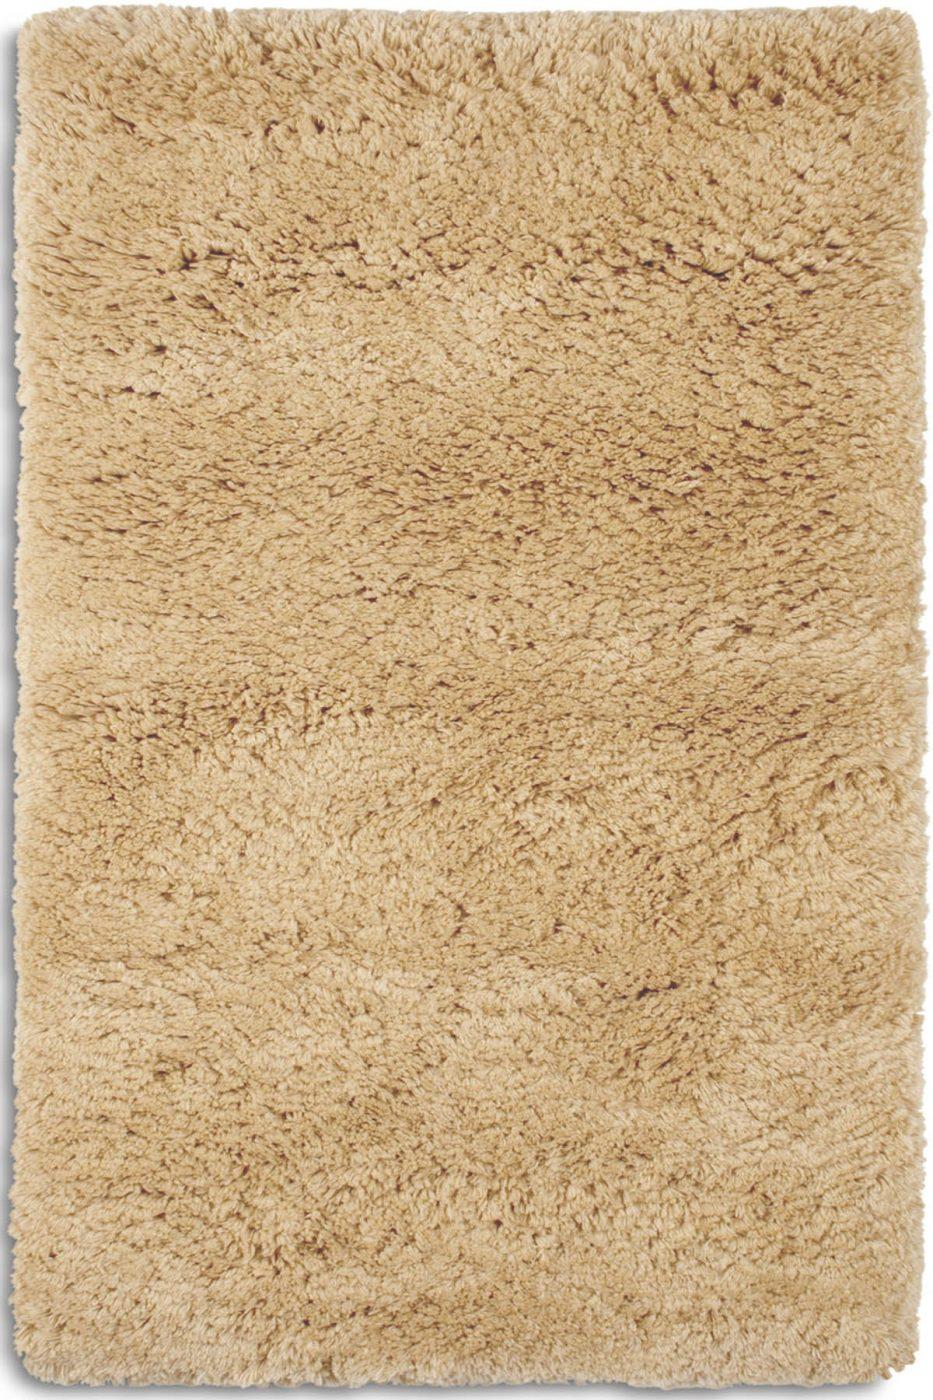 Shetland SHE01 | Plantation Rug Company | Best at Flooring